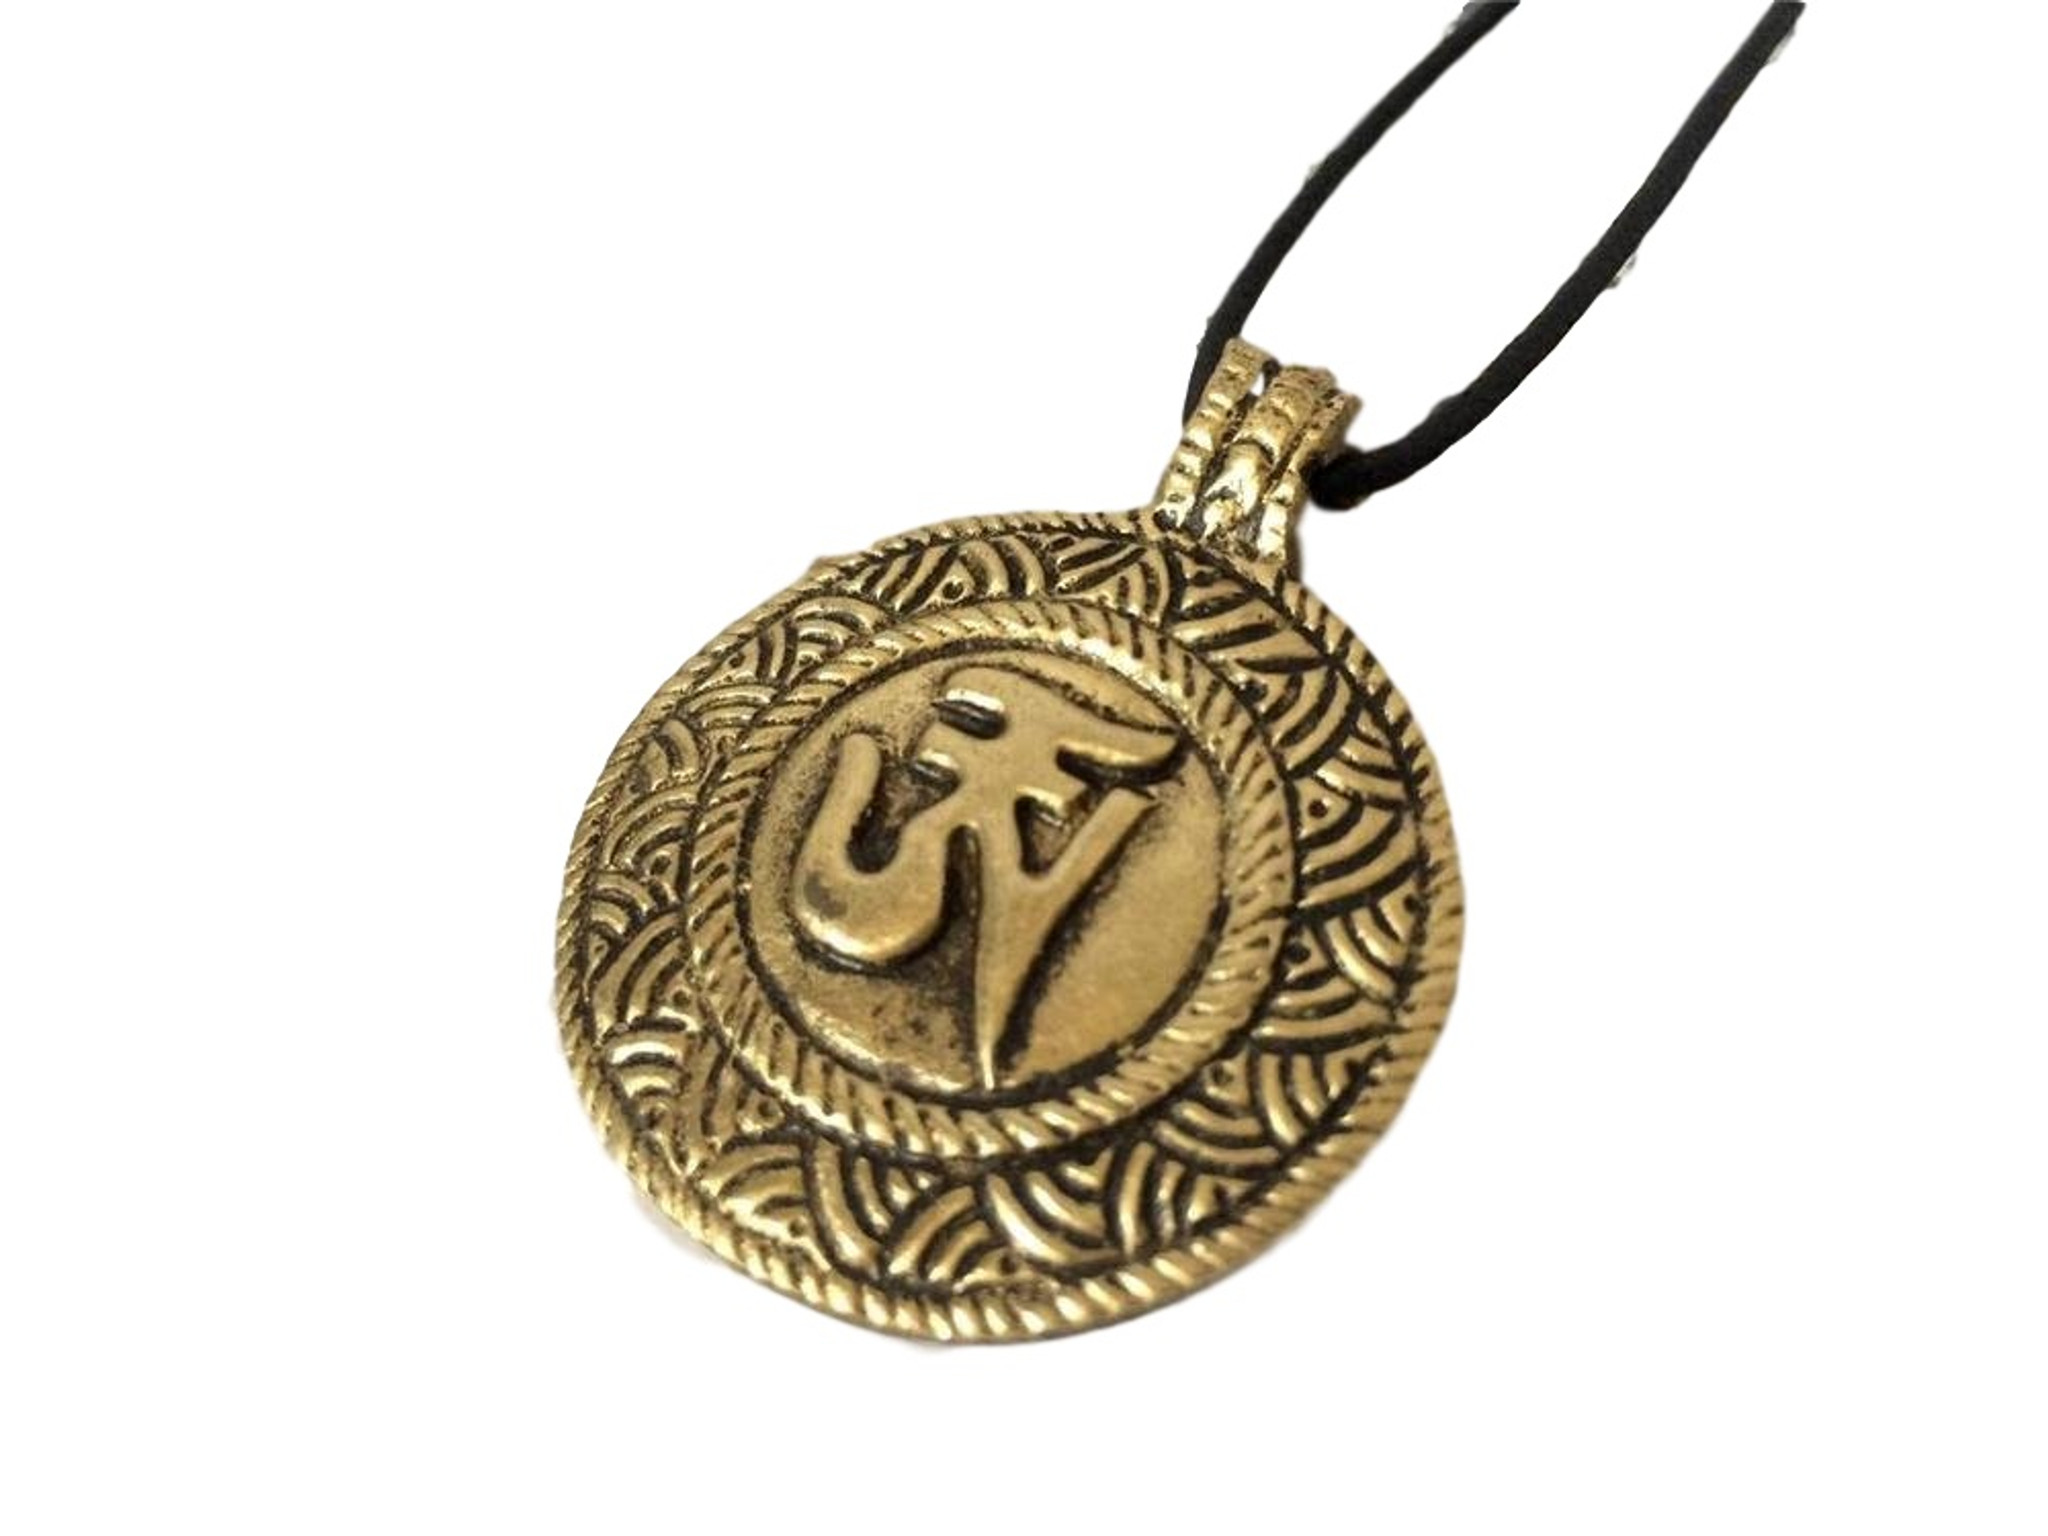 Om Pendant Tibetan Pendant Ohm Charm Handmade Jewelry Mantra Pendant Nepal Brass Inlay Bohemian Jewelry Yoga Jewelry Making Supplies 13190